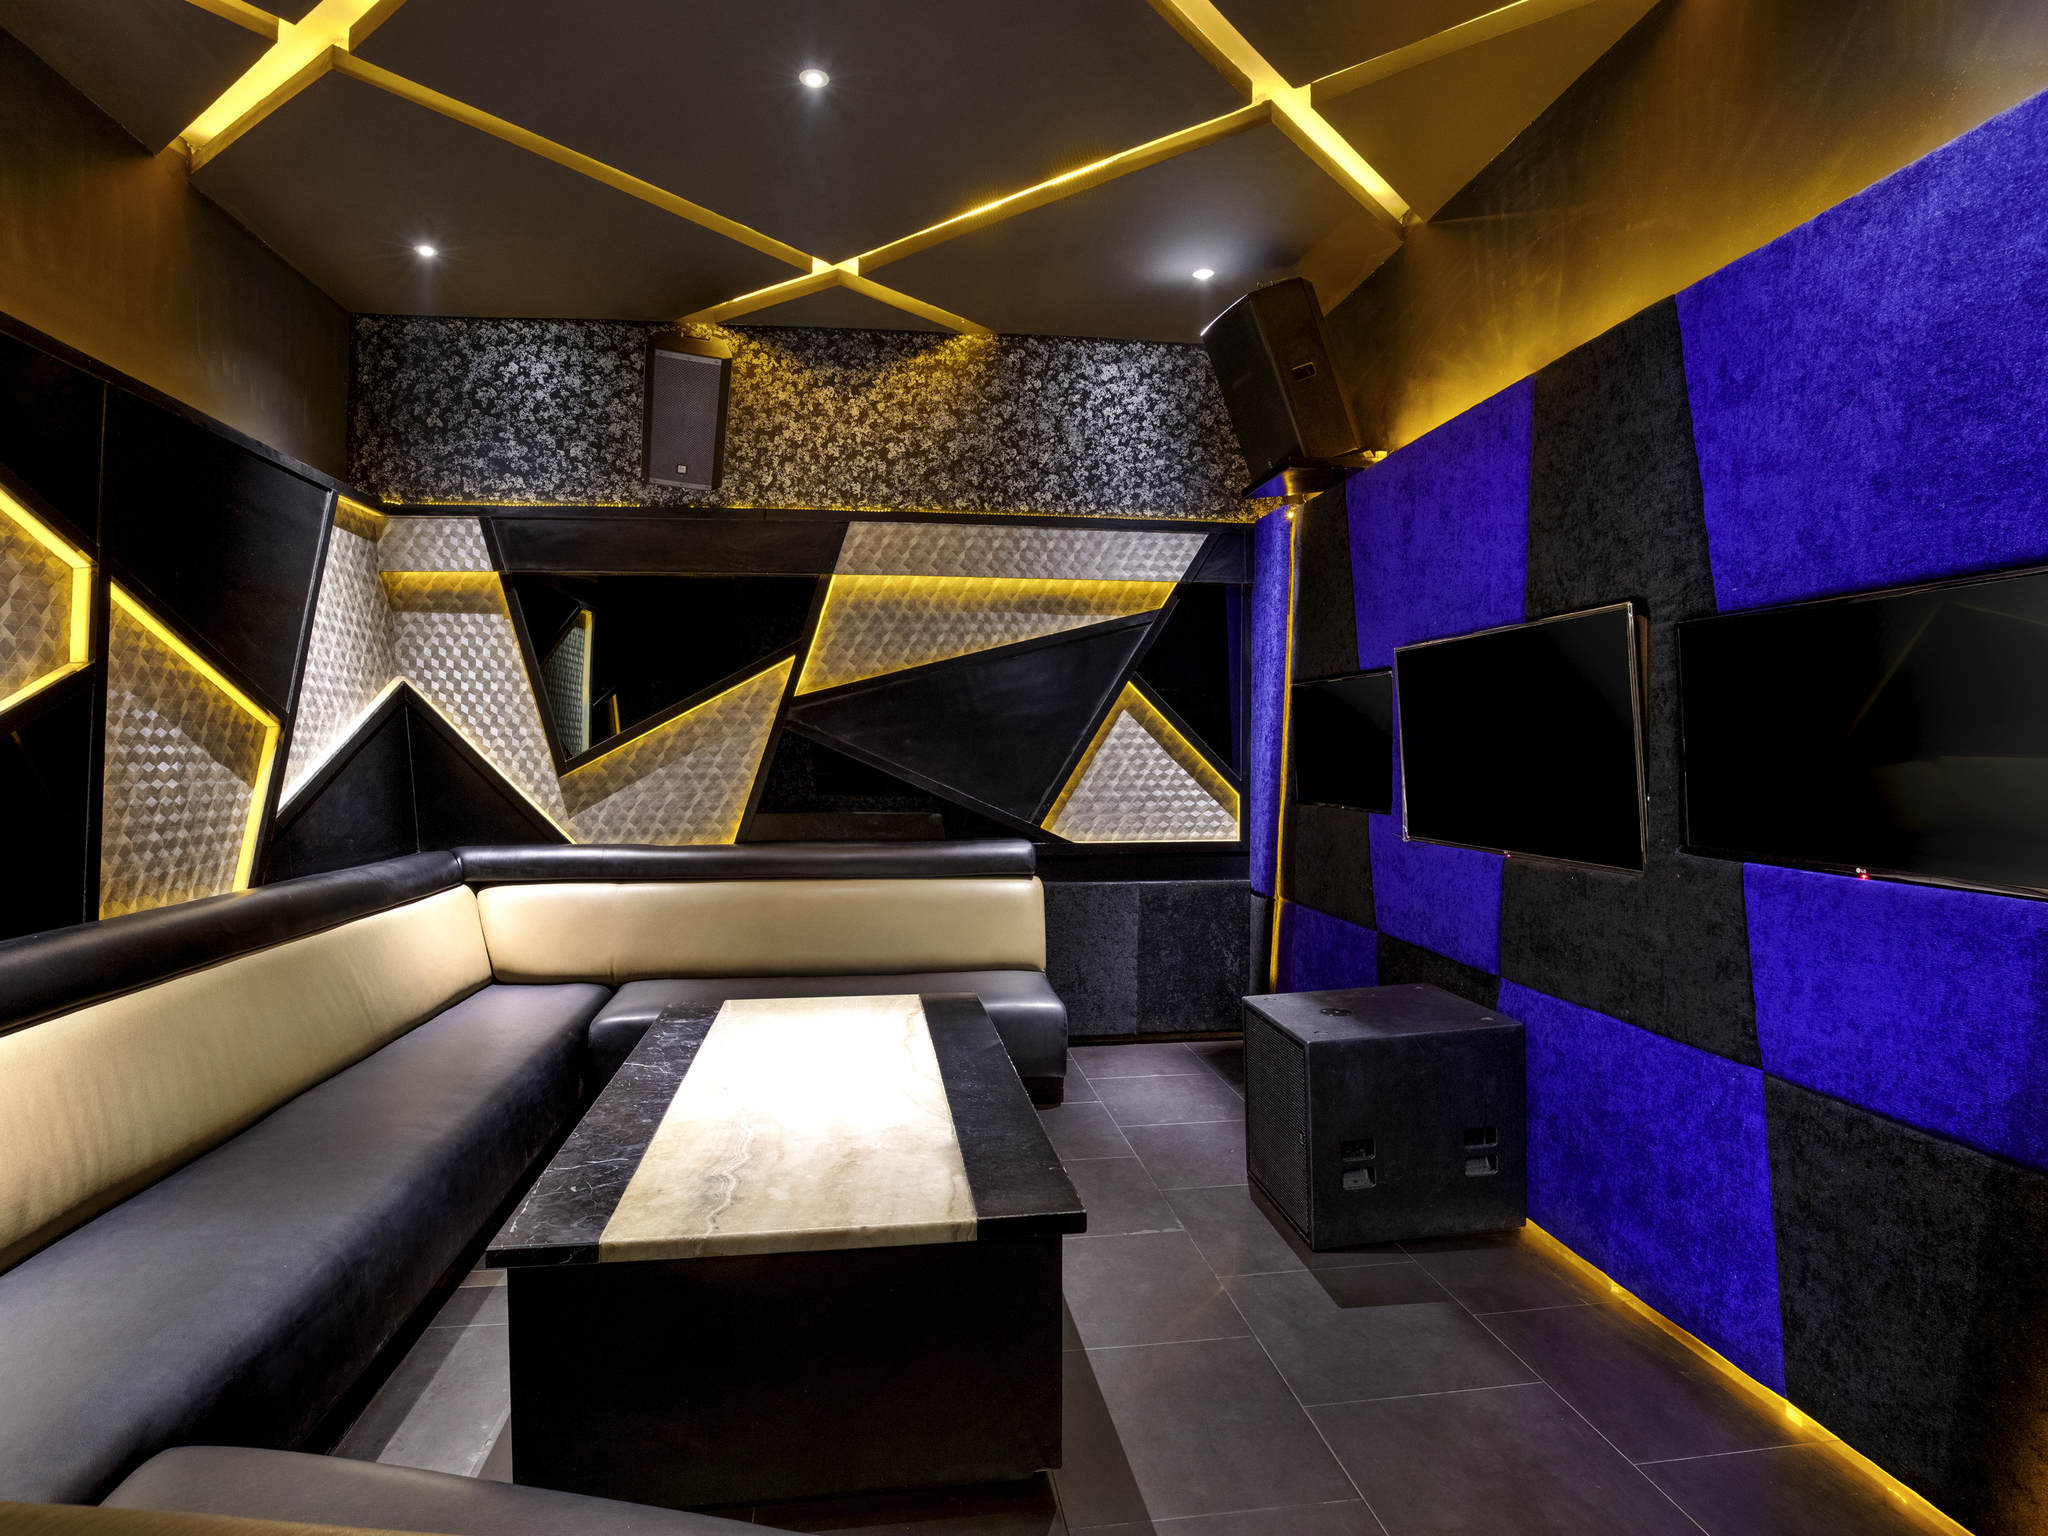 Hotel In Palembang Novotel Residence Accorhotels Kukies Kelapa By Agung Mirah Bali Services